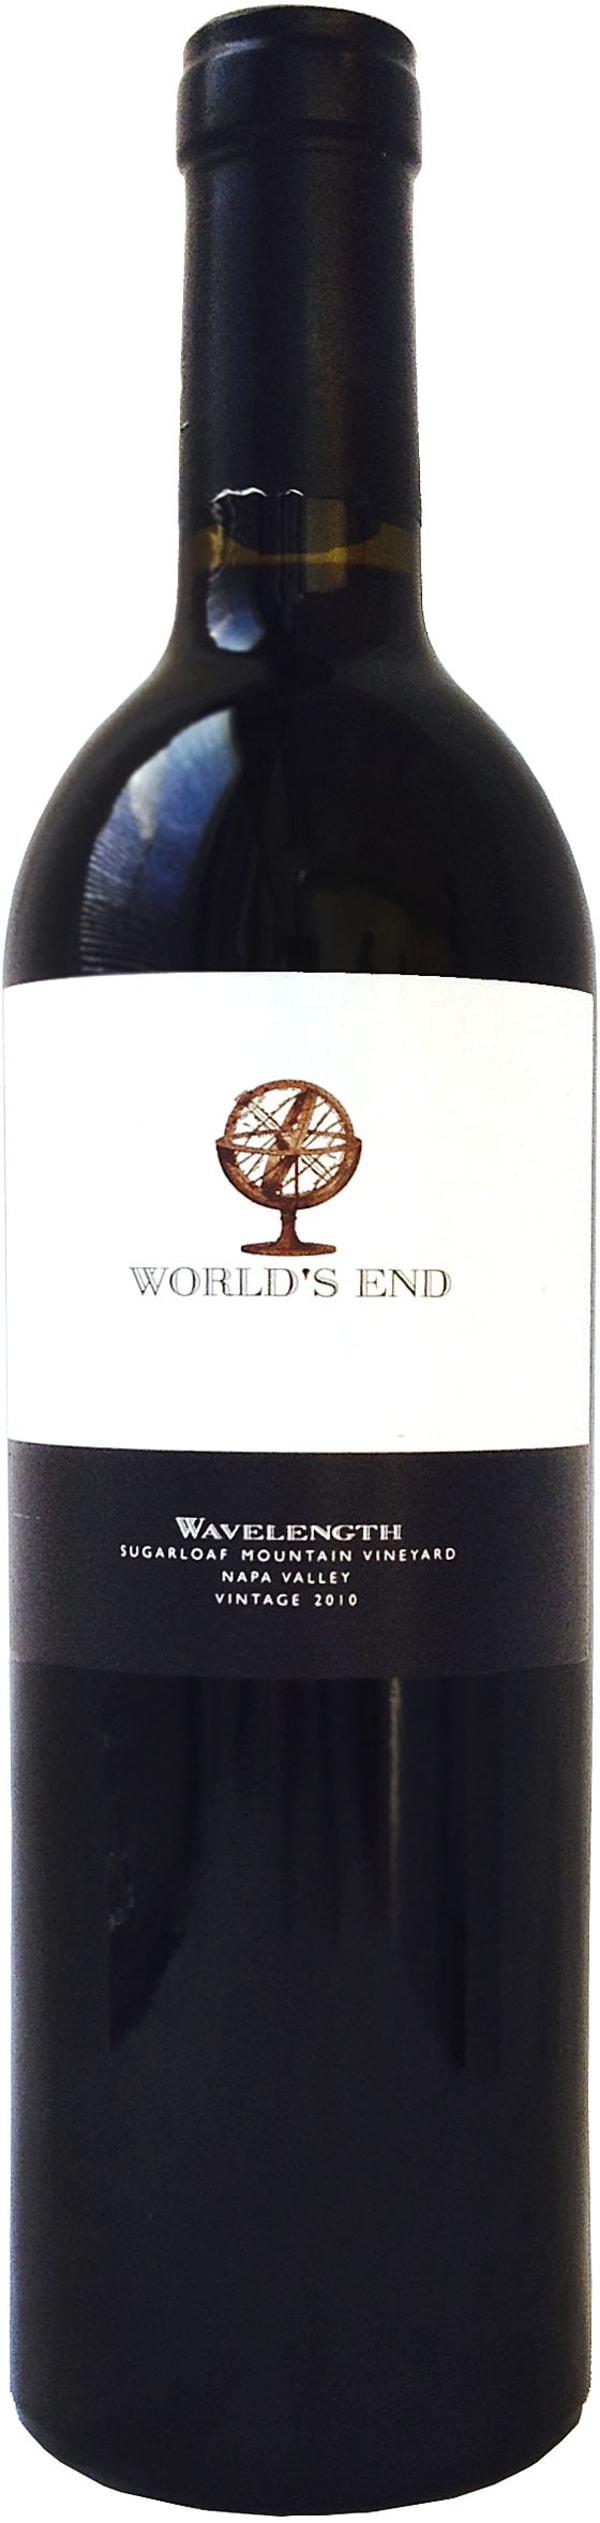 Worlds End Wavelength 2010